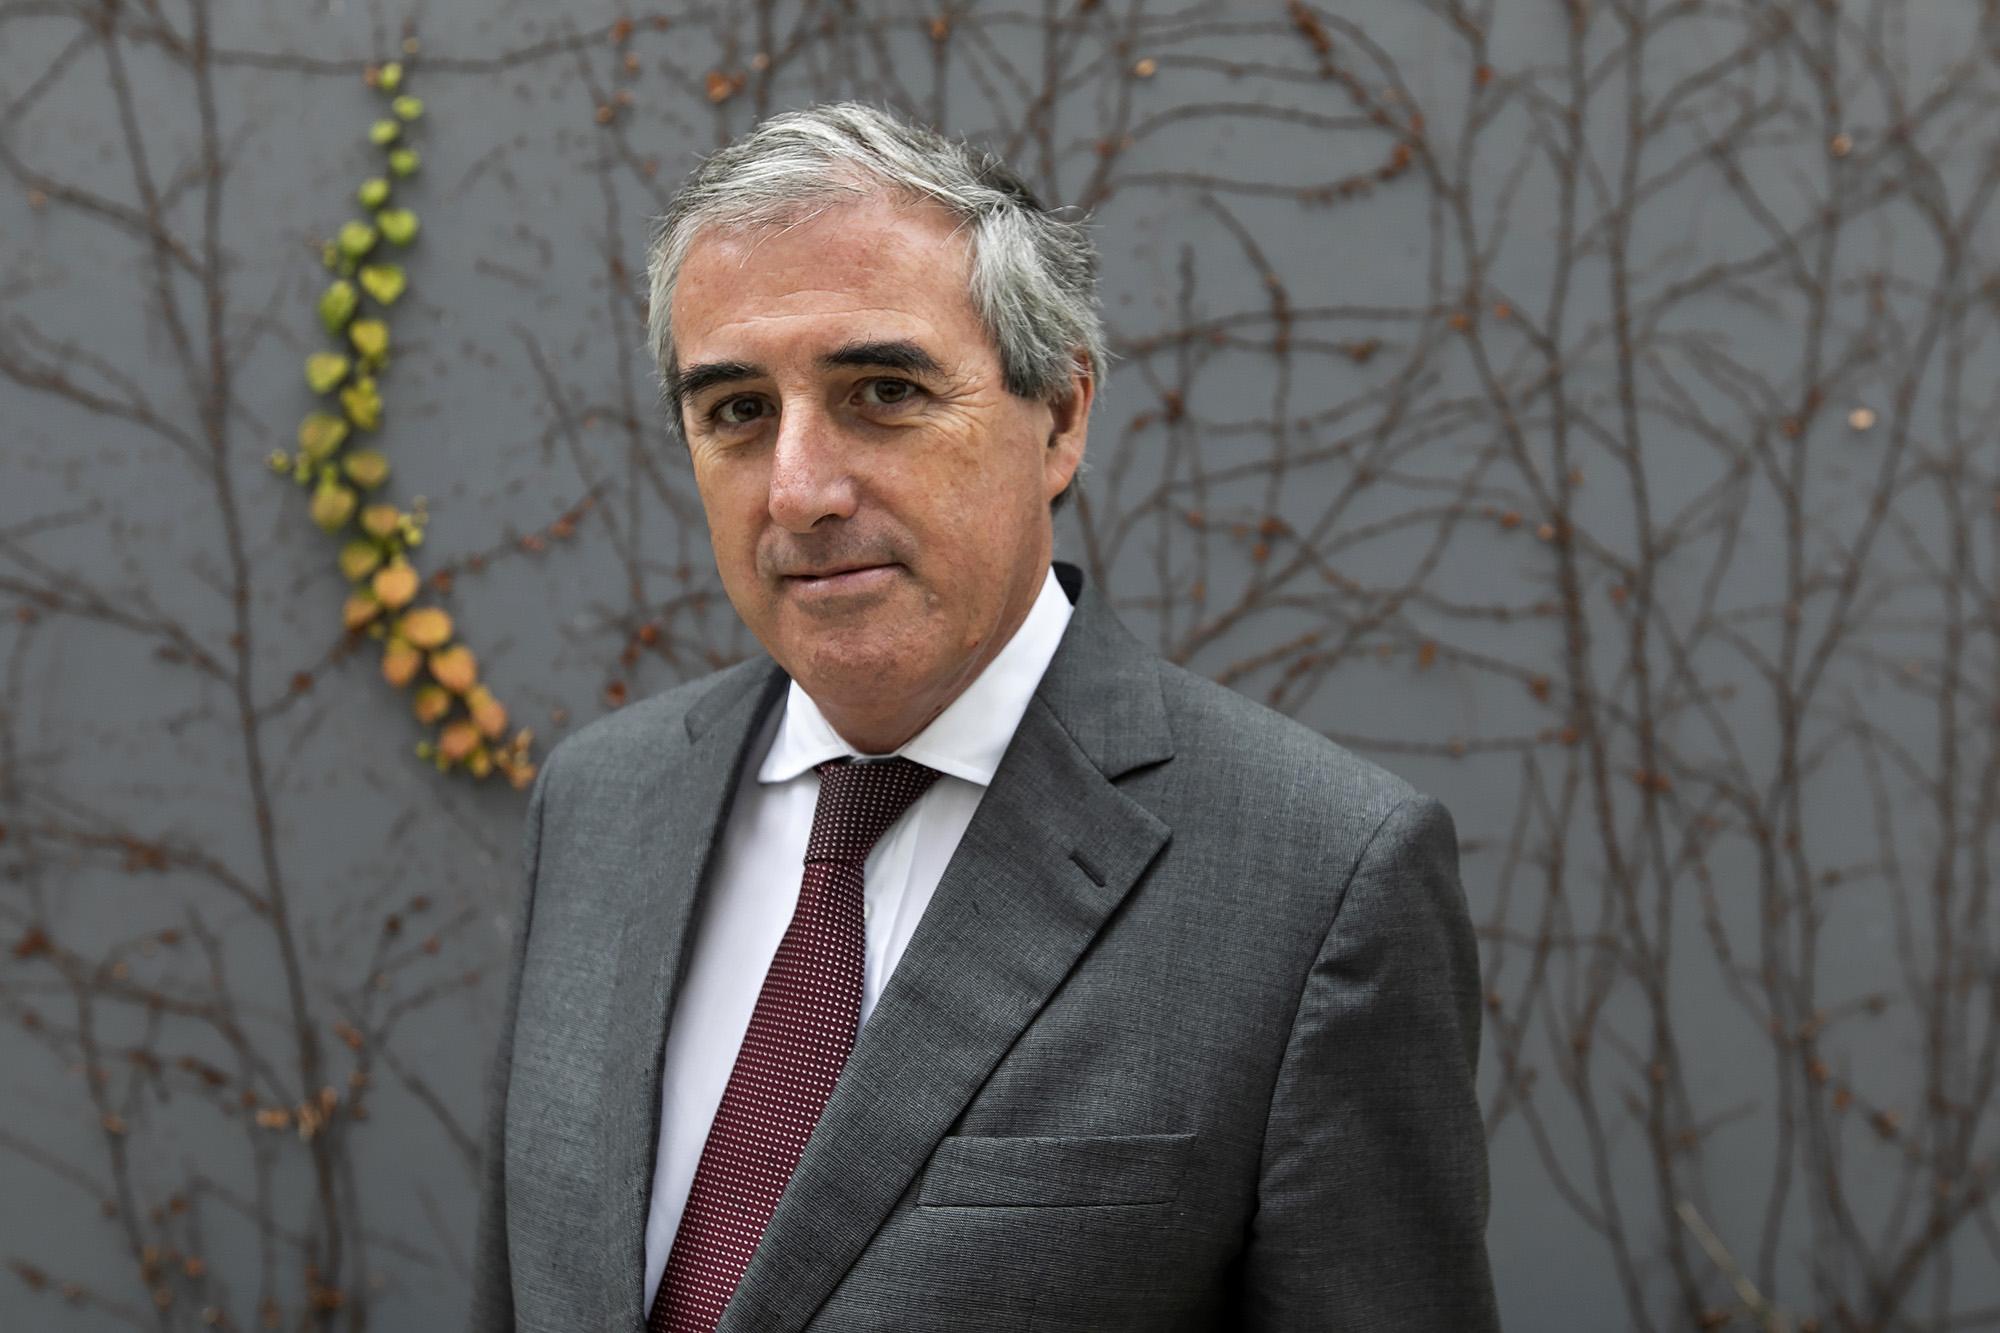 Miguel Teixeira de Abreu em entrevista ao ECO/Advocatus - 18JAN19